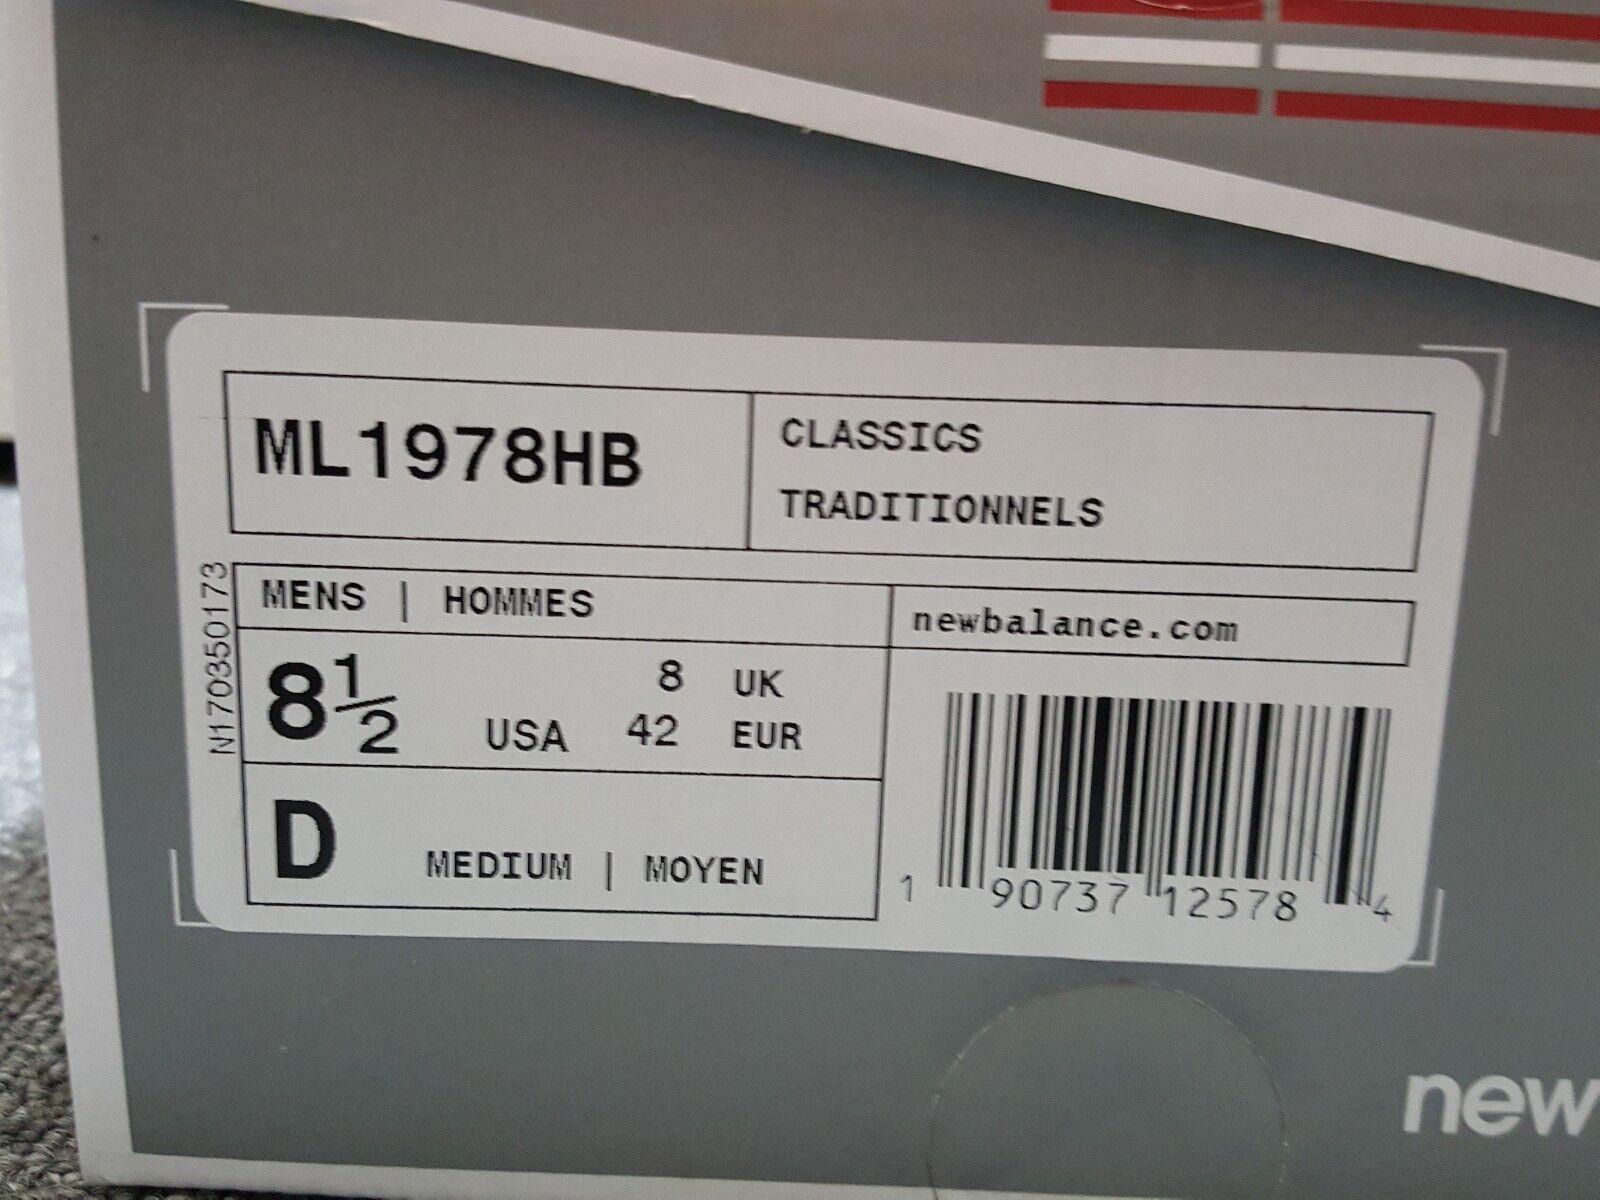 150 New Balance Red Salmon 1978 Sz RARE Made In USA Shoes Sz 1978 8.5 ML1978HB NIB 3ed60f